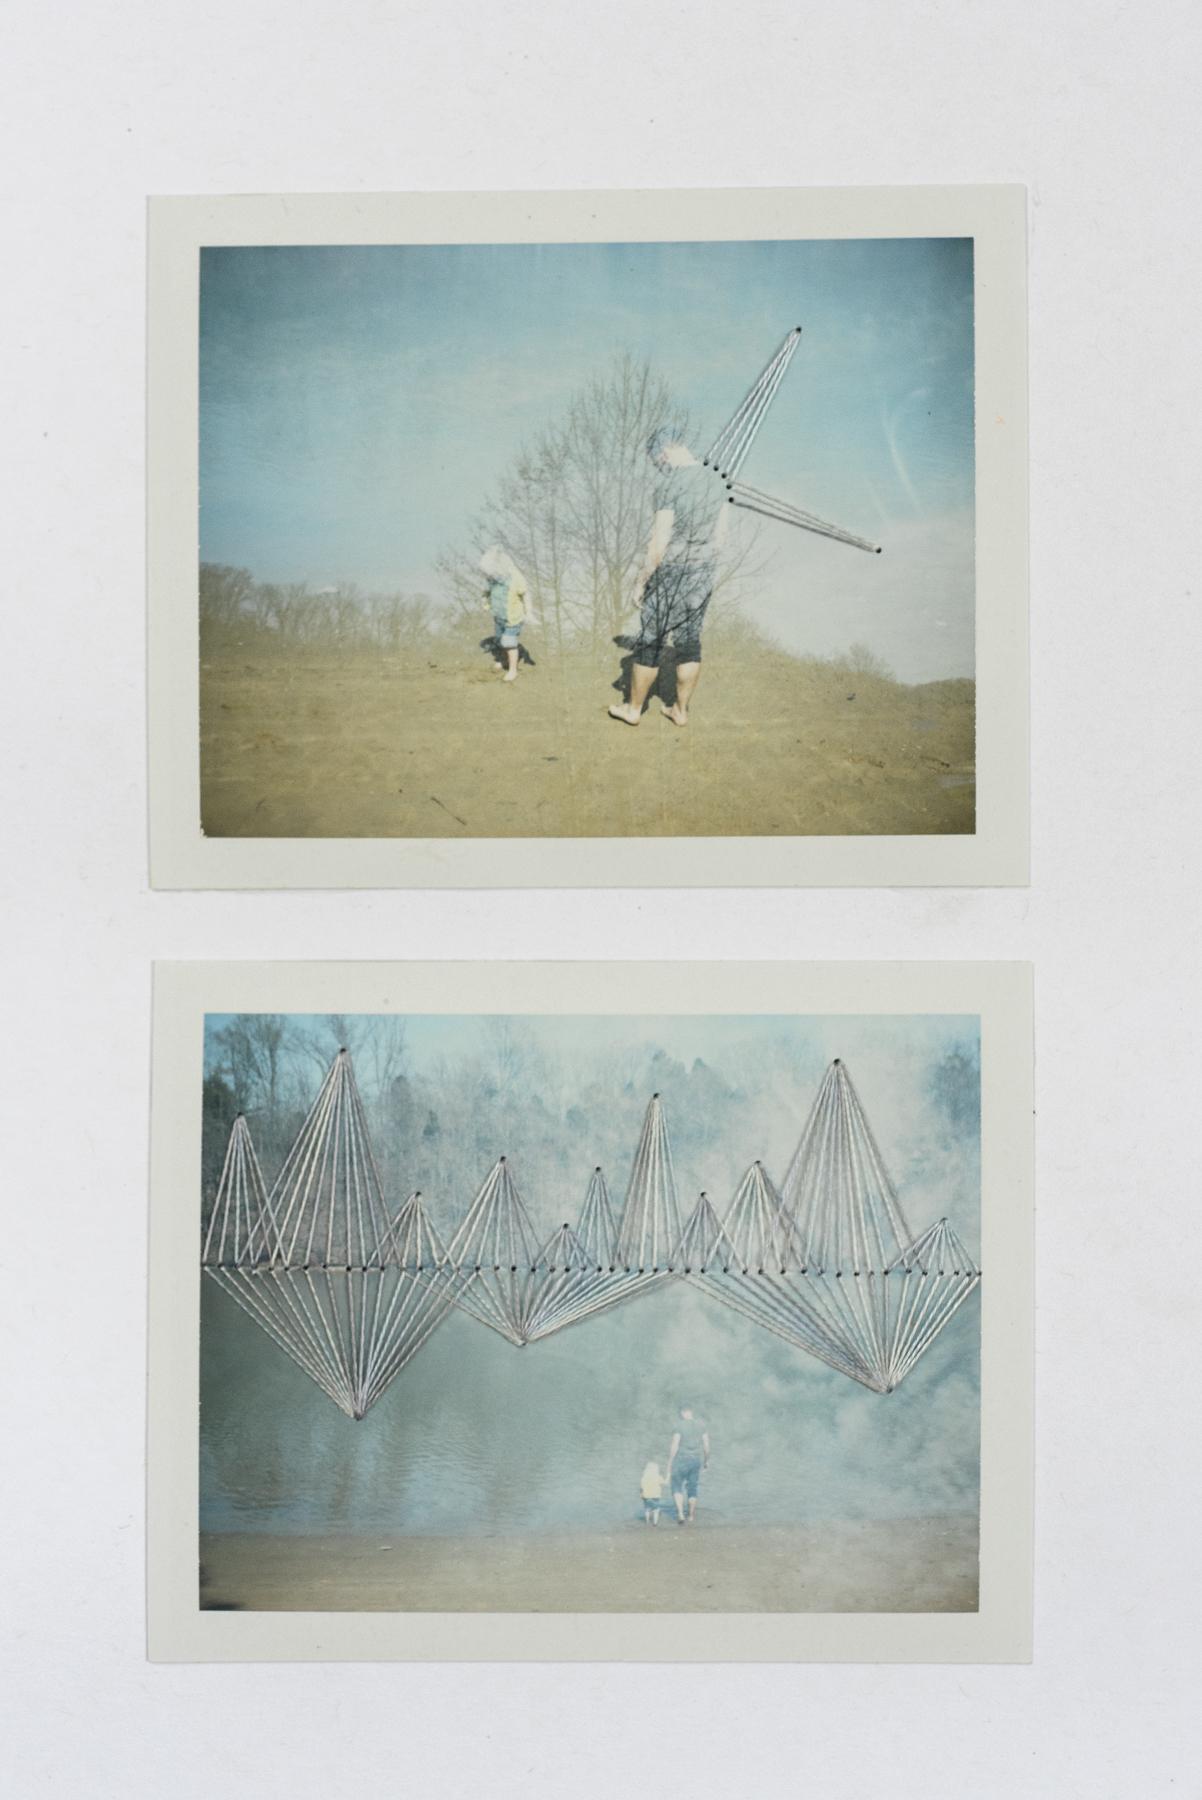 The Father | Polaroid Land Camera 250 | Jocelyn Mathewes